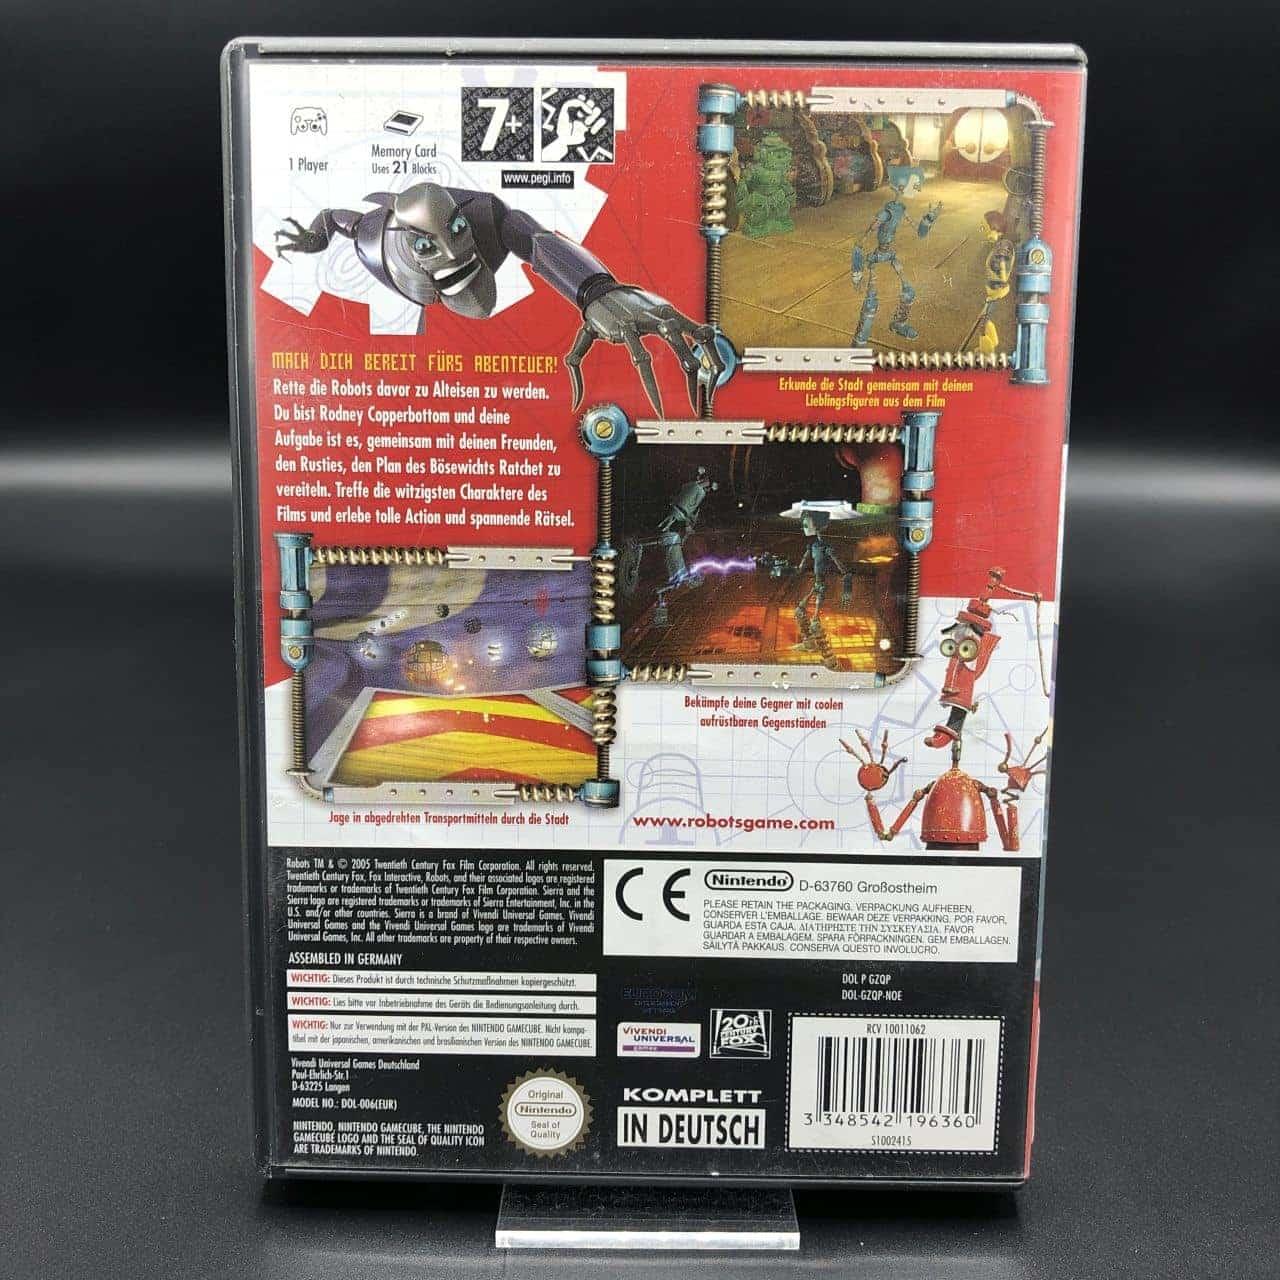 GC Robots (Komplett) (Sehr gut) Nintendo GameCube